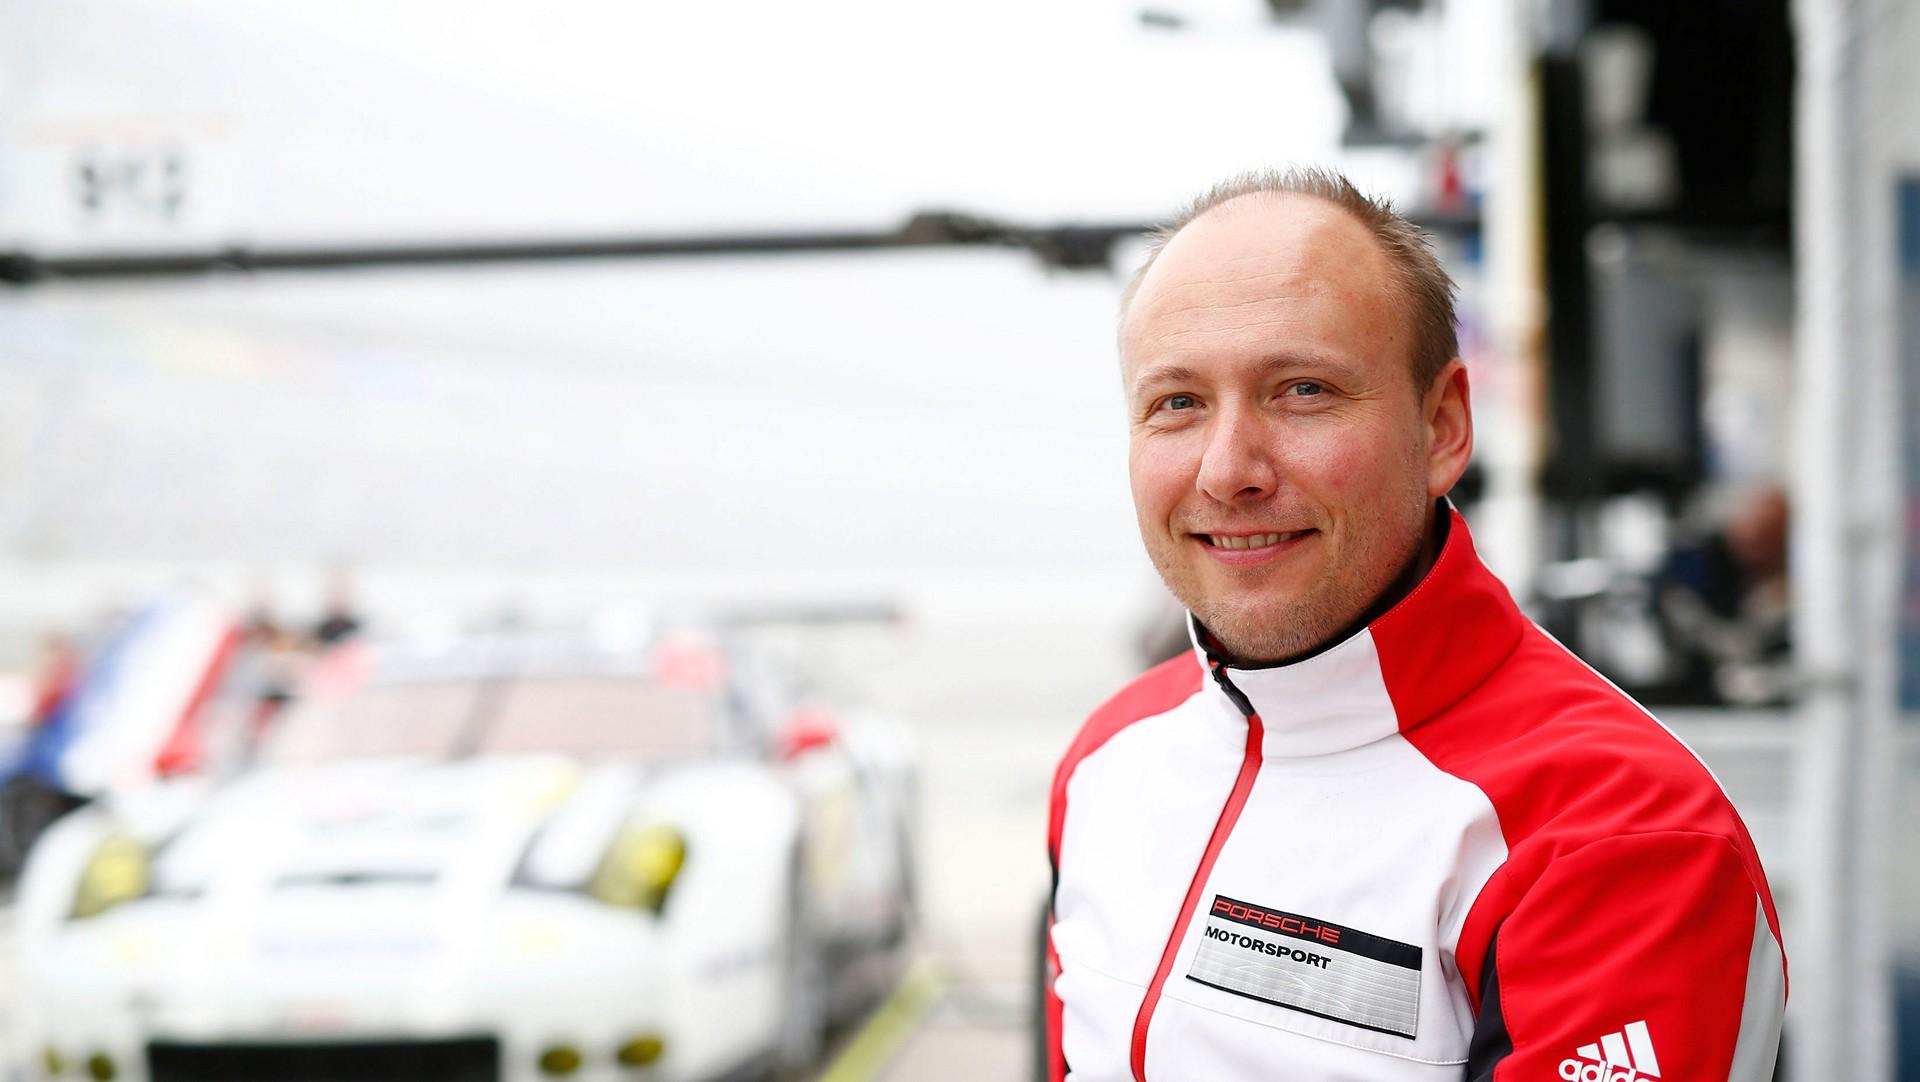 Marco Ujhasi, Head of GT Customer Motorsport, Daytona, IMSA WeatherTech SportsCar Championship © Dr. Ing. h.c. F. Porsche AG